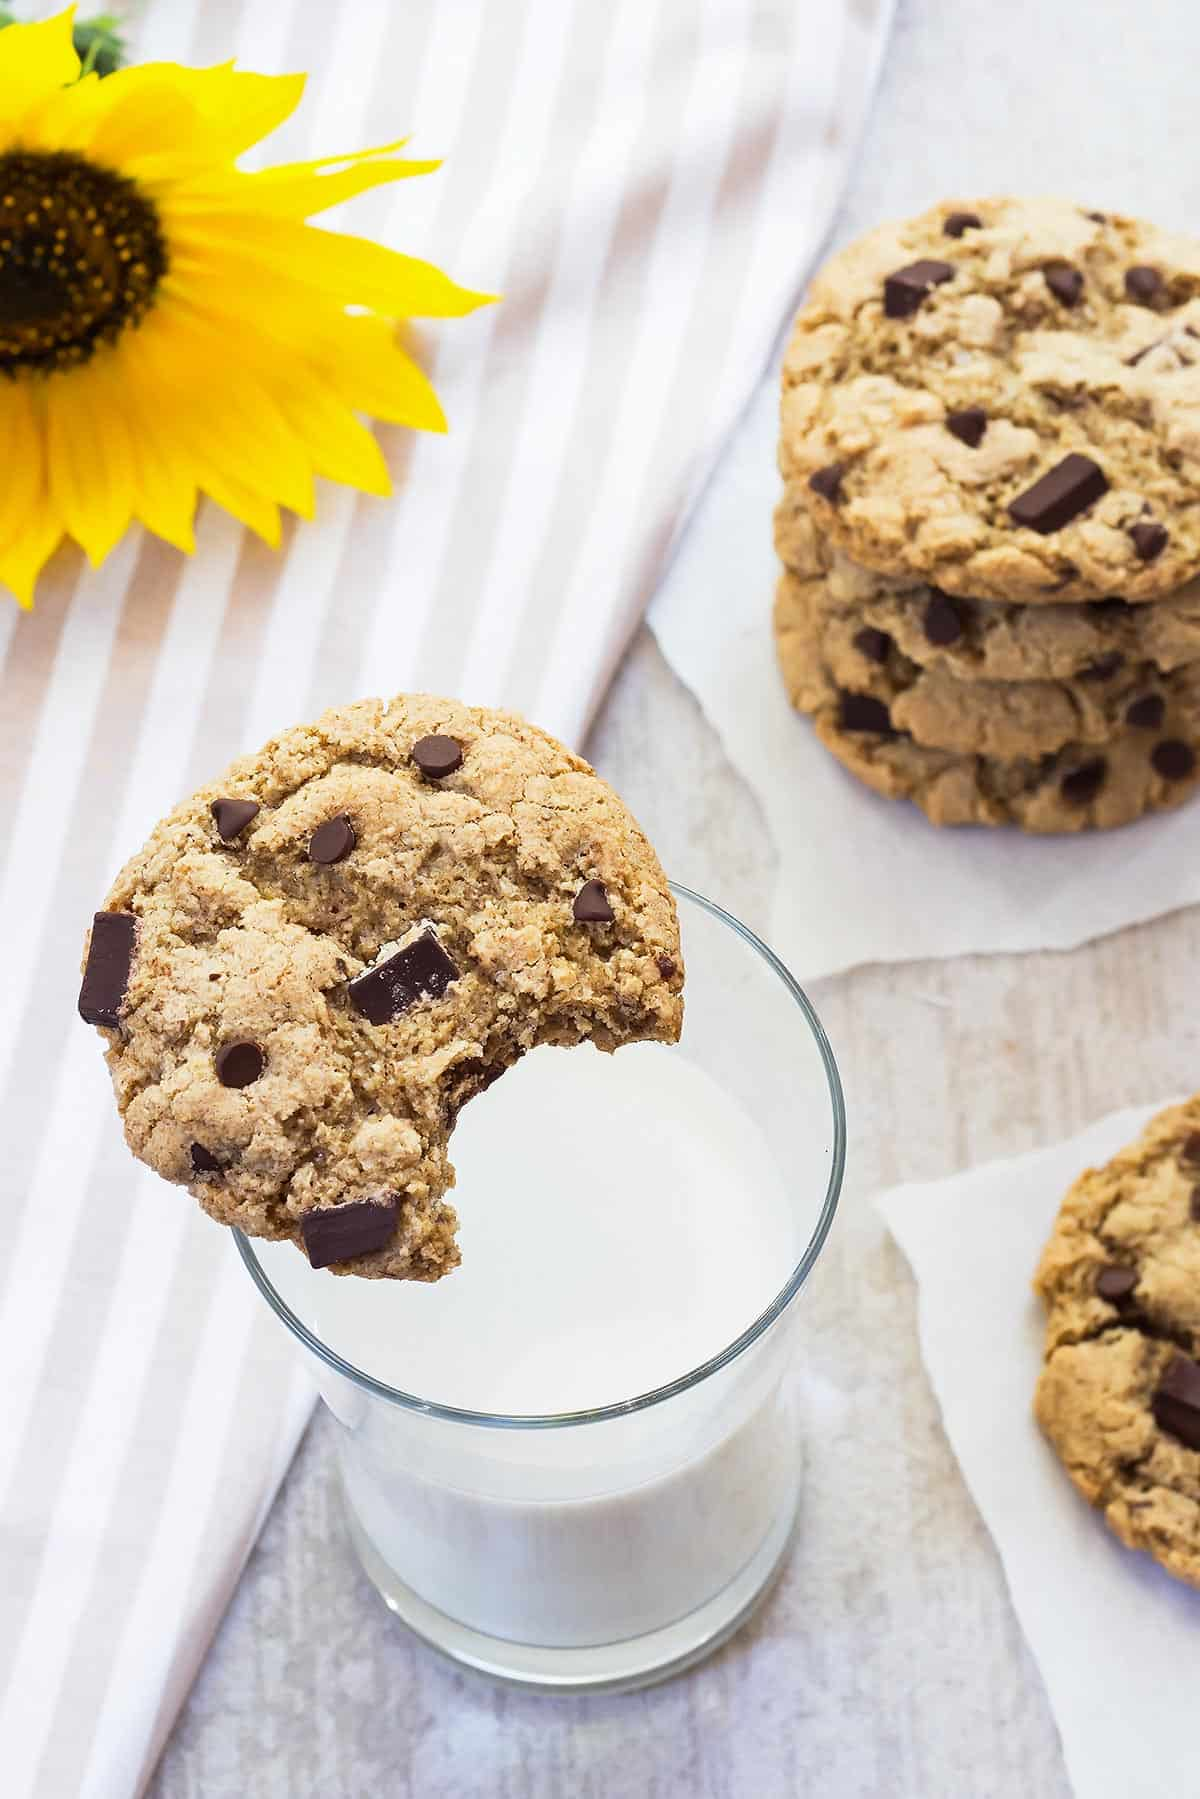 Tiger Nut Flour Gluten Free Chocolate Chip Cookies